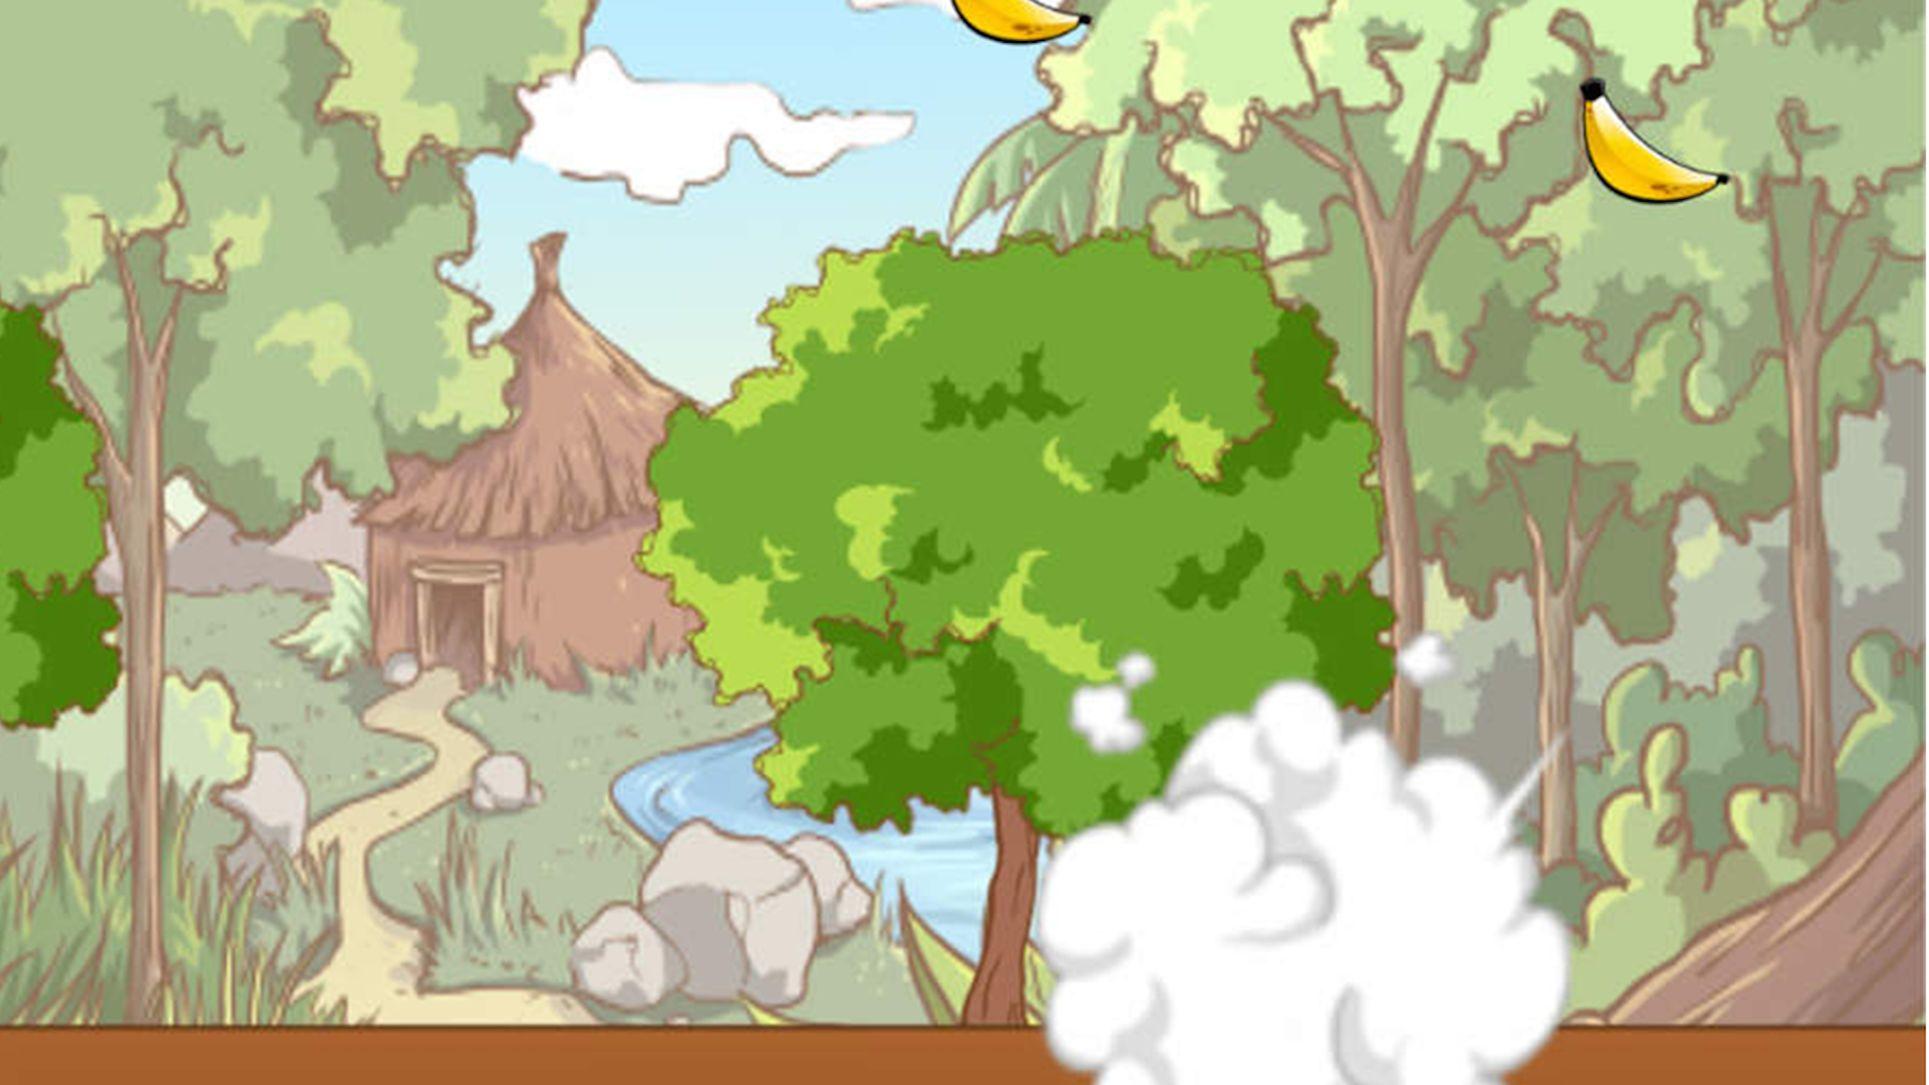 Spider Monkey Slide and Jump! GamesFreeArcade